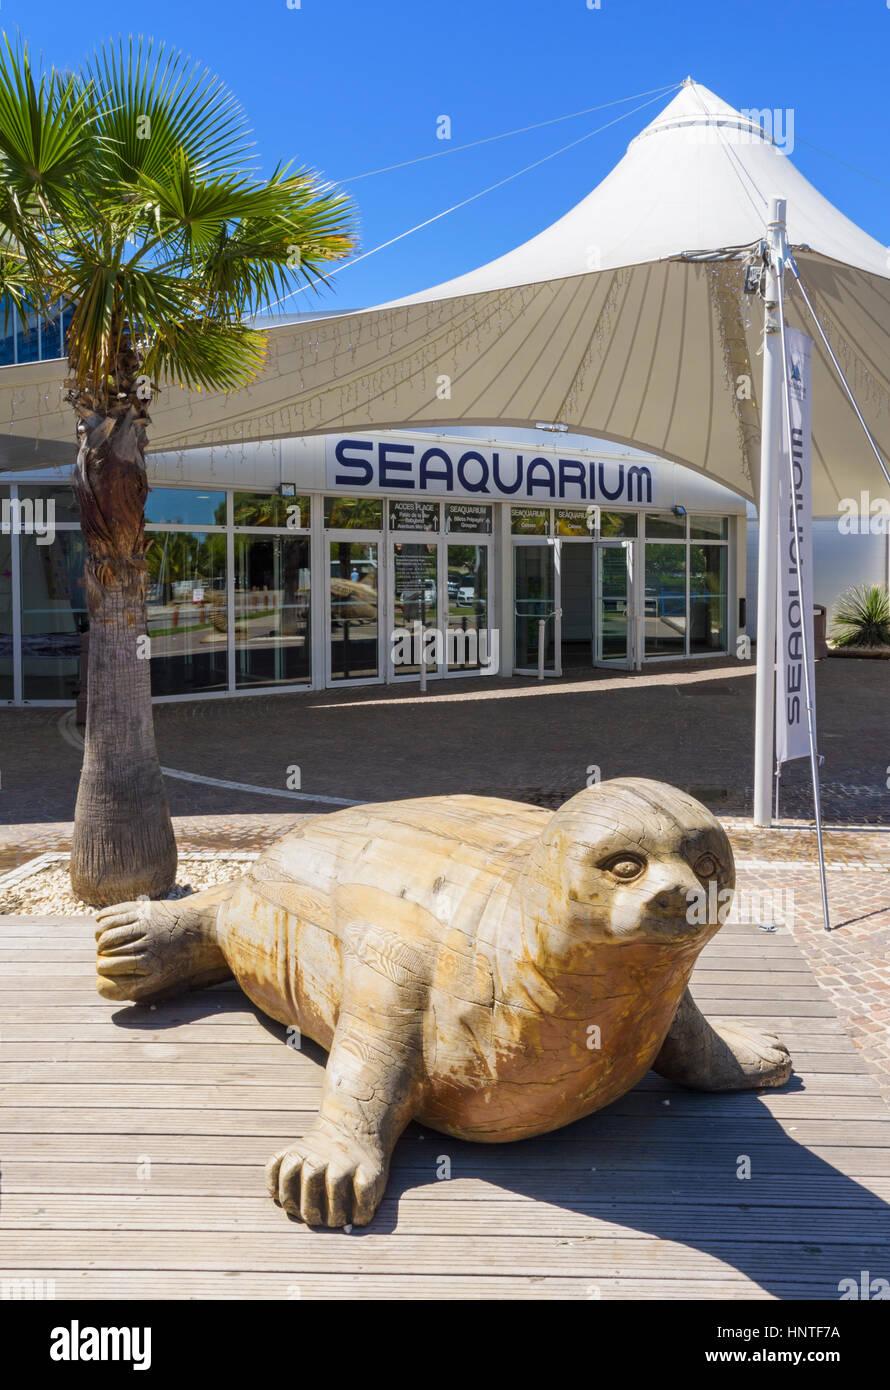 Wooden seal sculpture outside the Seaquarium entrance in Le Grau-du-Roi, Gard, France Stock Photo